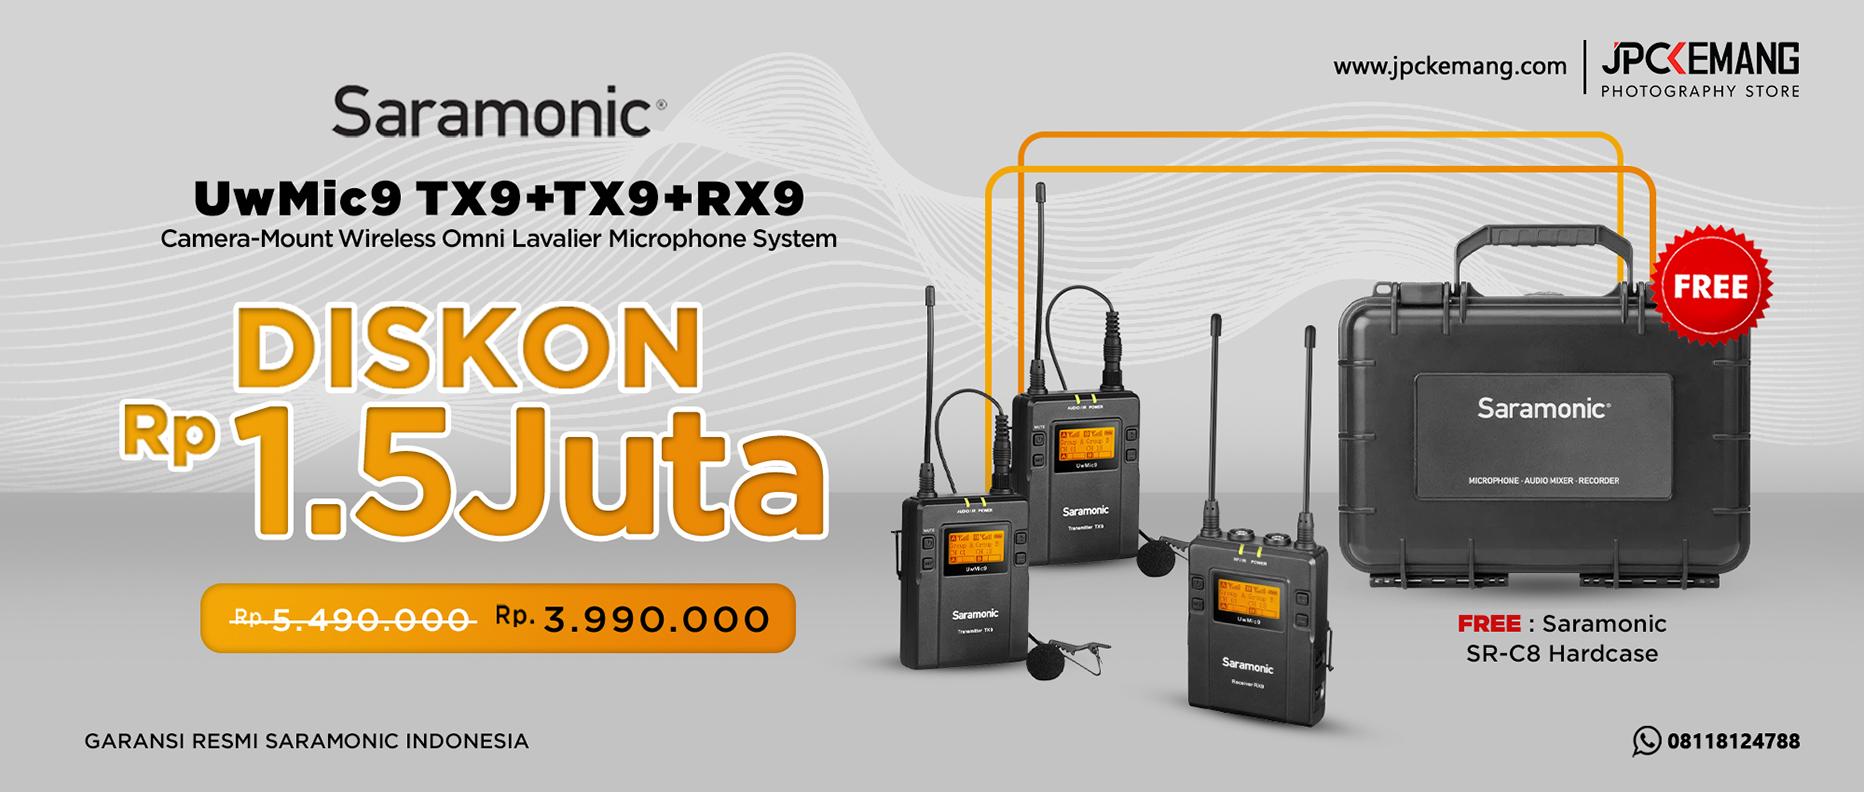 Saramonic UwMic9 Kit2 Wireless Omni Lavalier Microphone System